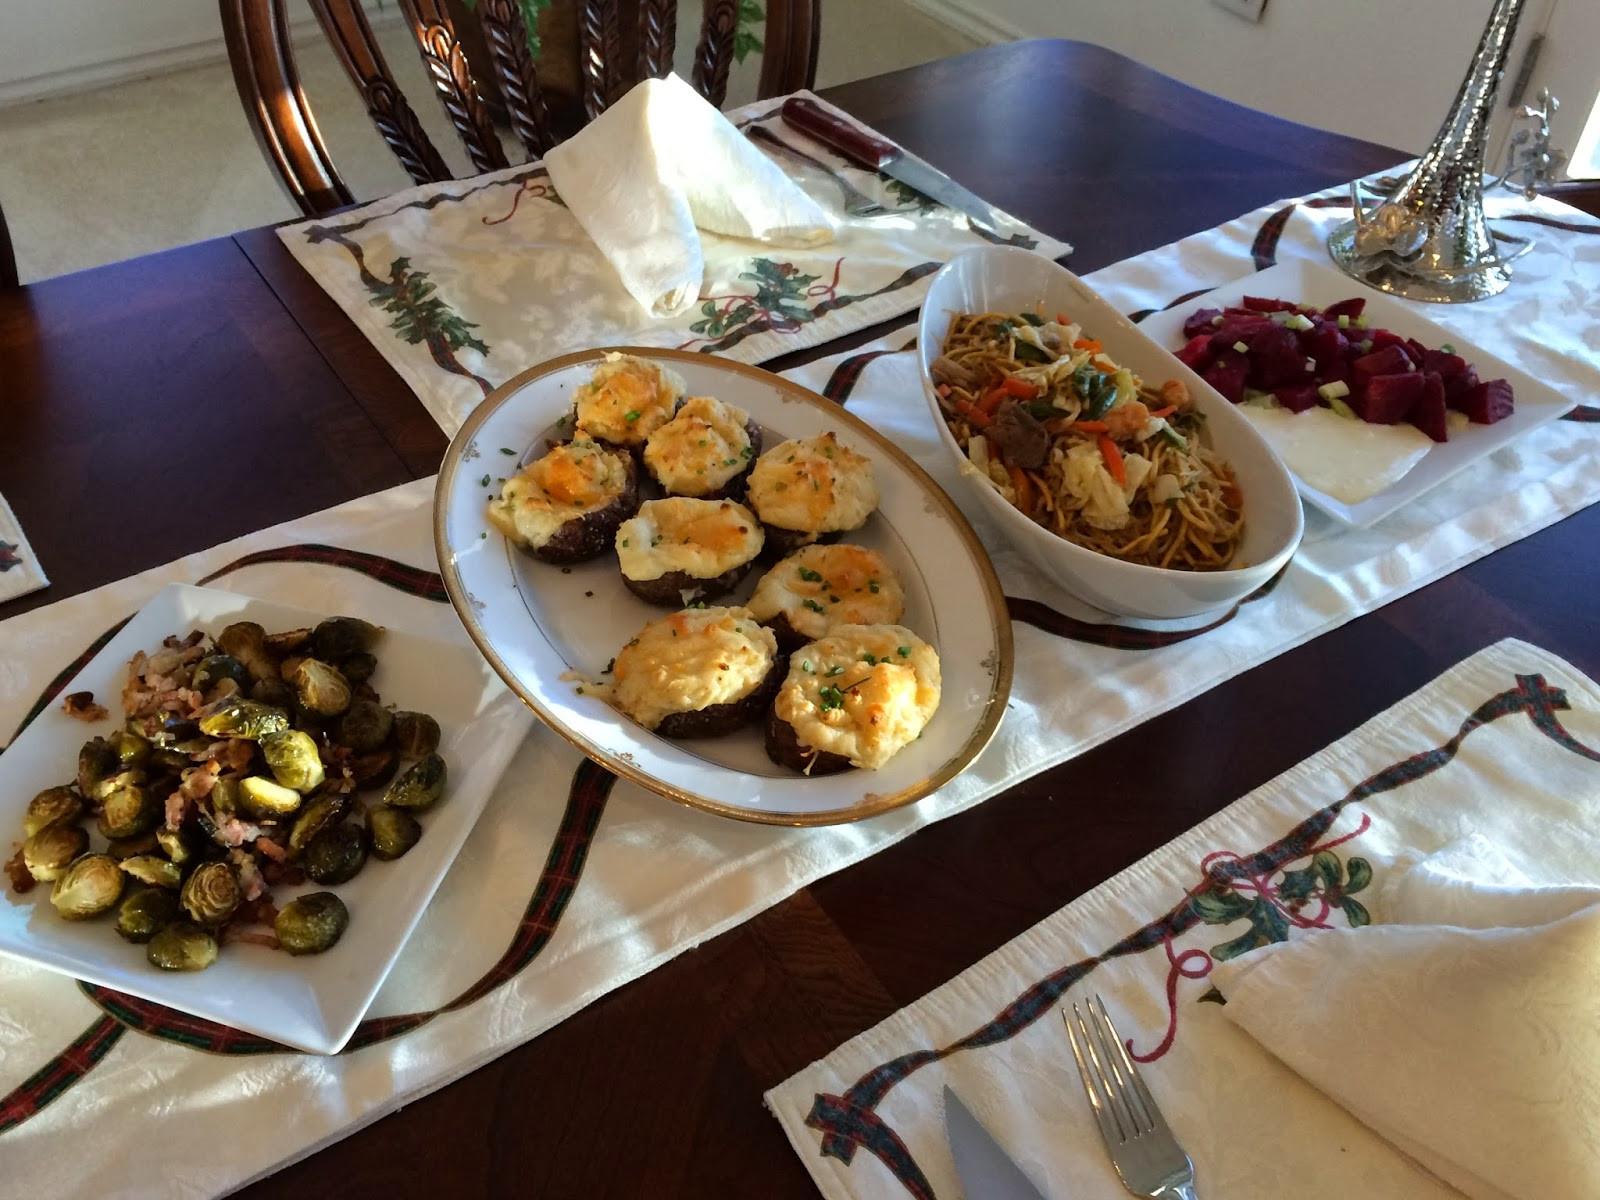 Prime Rib Sides For Christmas Dinner  TASTE OF HAWAII CHRISTMAS PRIME RIB DINNER AT HOME